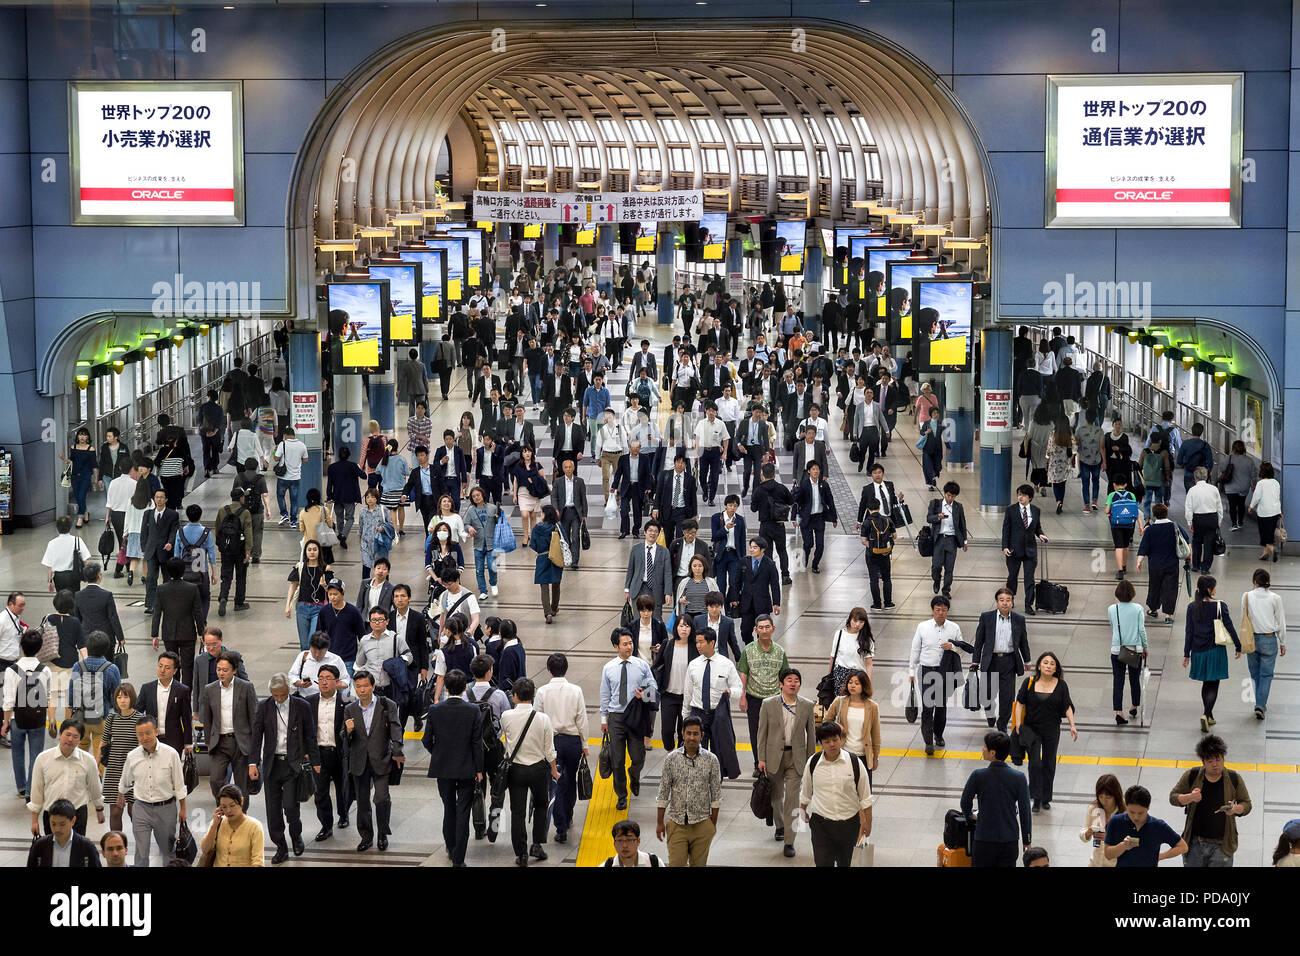 L'île de Honshu, Japon, Tokyo, Kanto, la gare de Shinagawa. Photo Stock